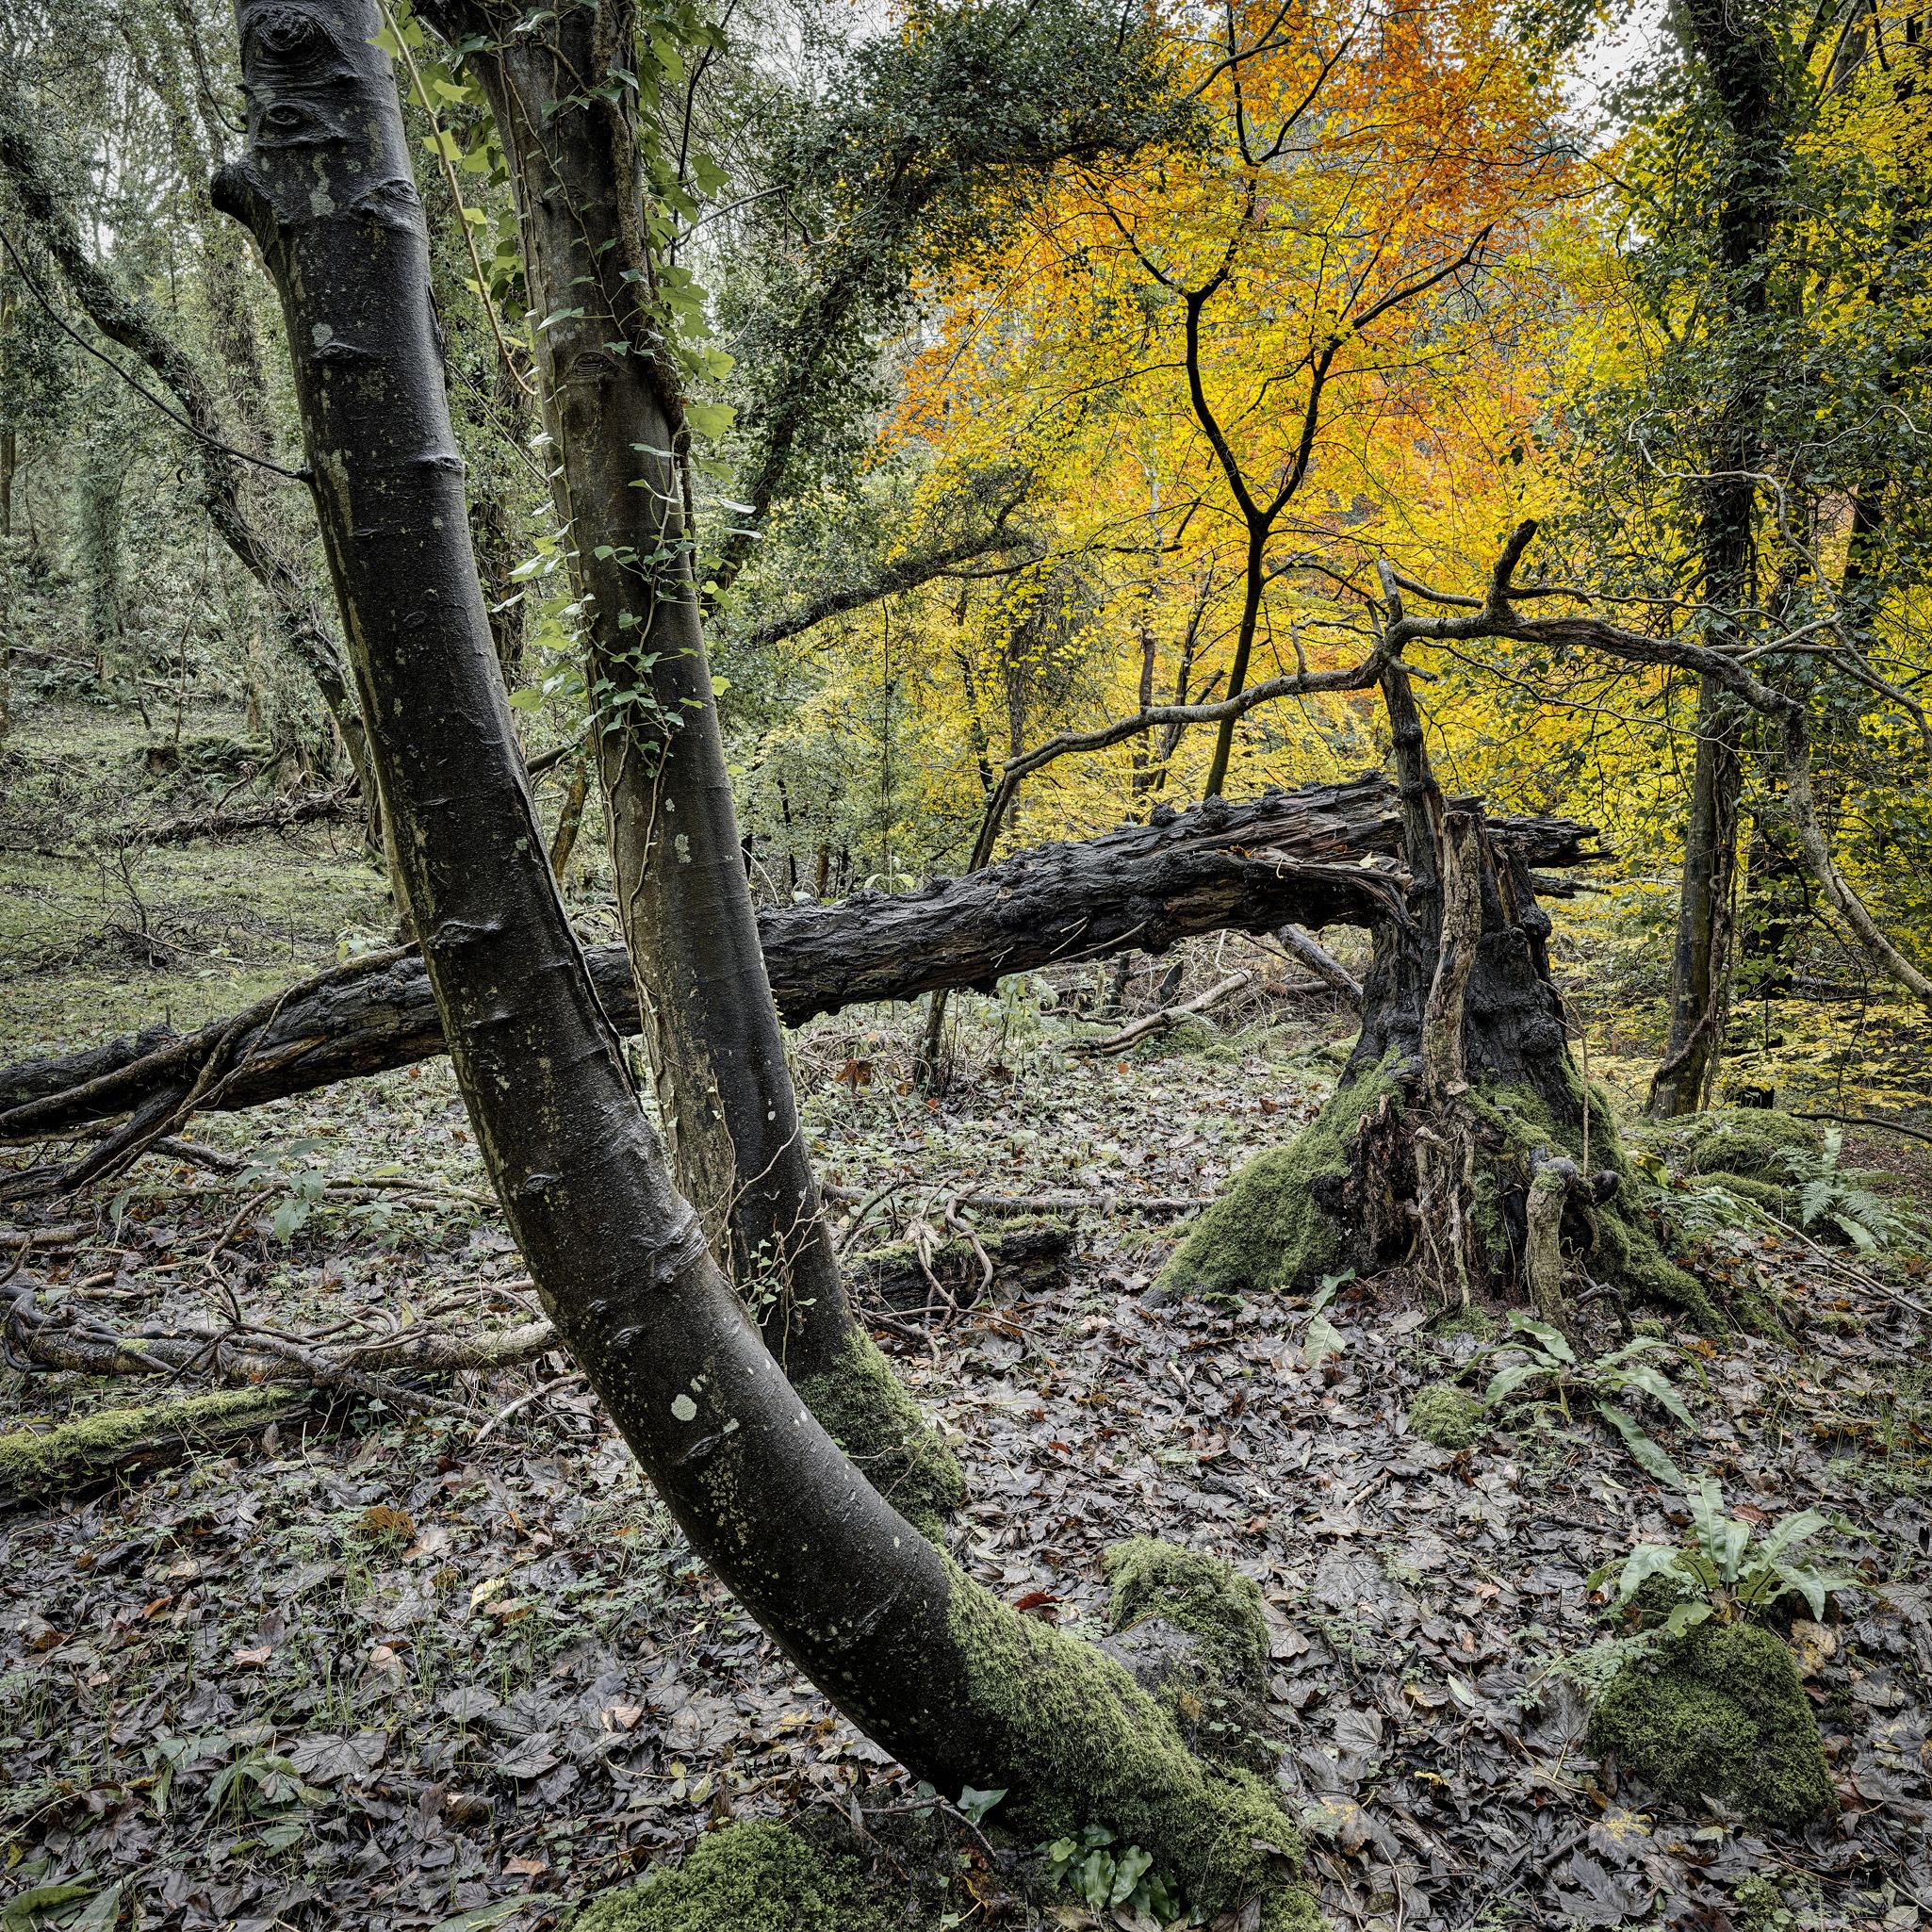 autumn leaves autumn forest photo